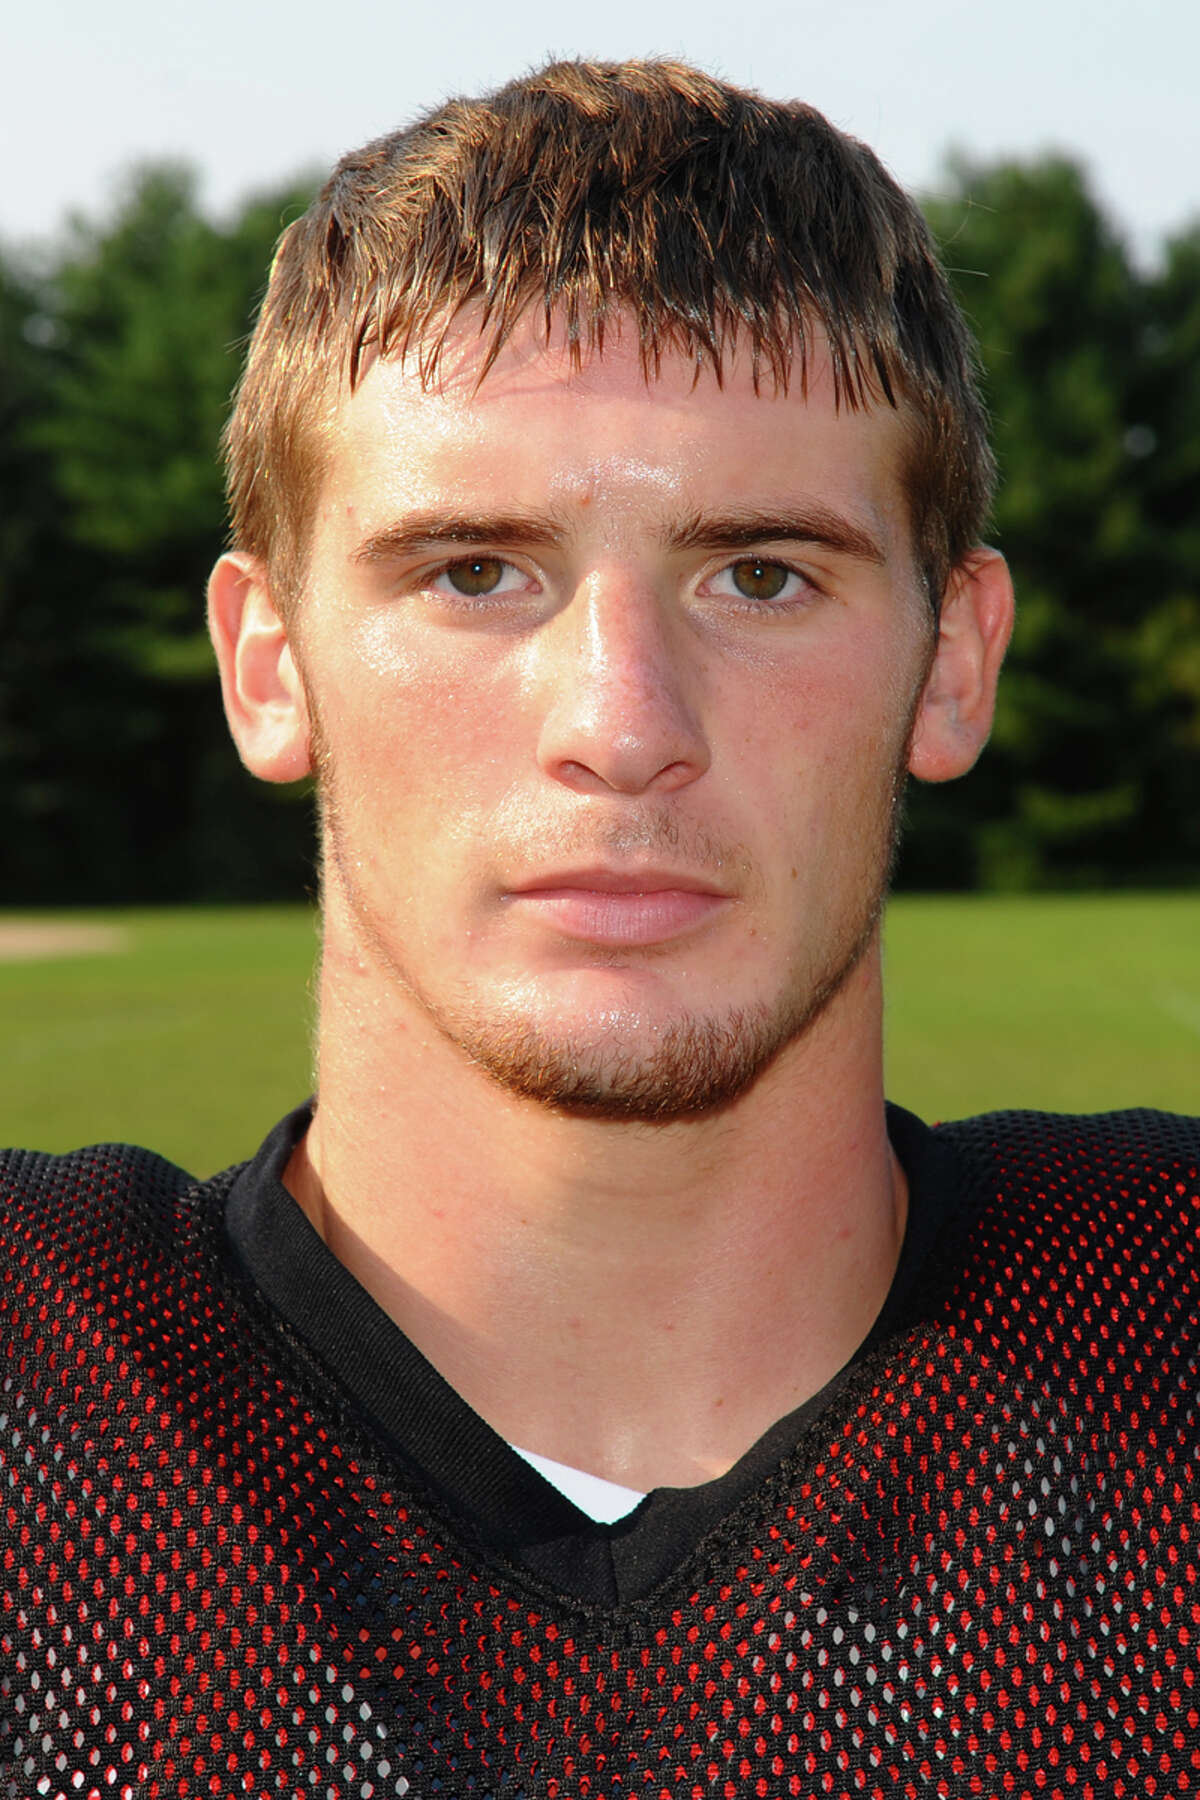 Masuk High School's Thomas Milone during football practice in Monroe, Conn. on Wednesday August 30, 2012.